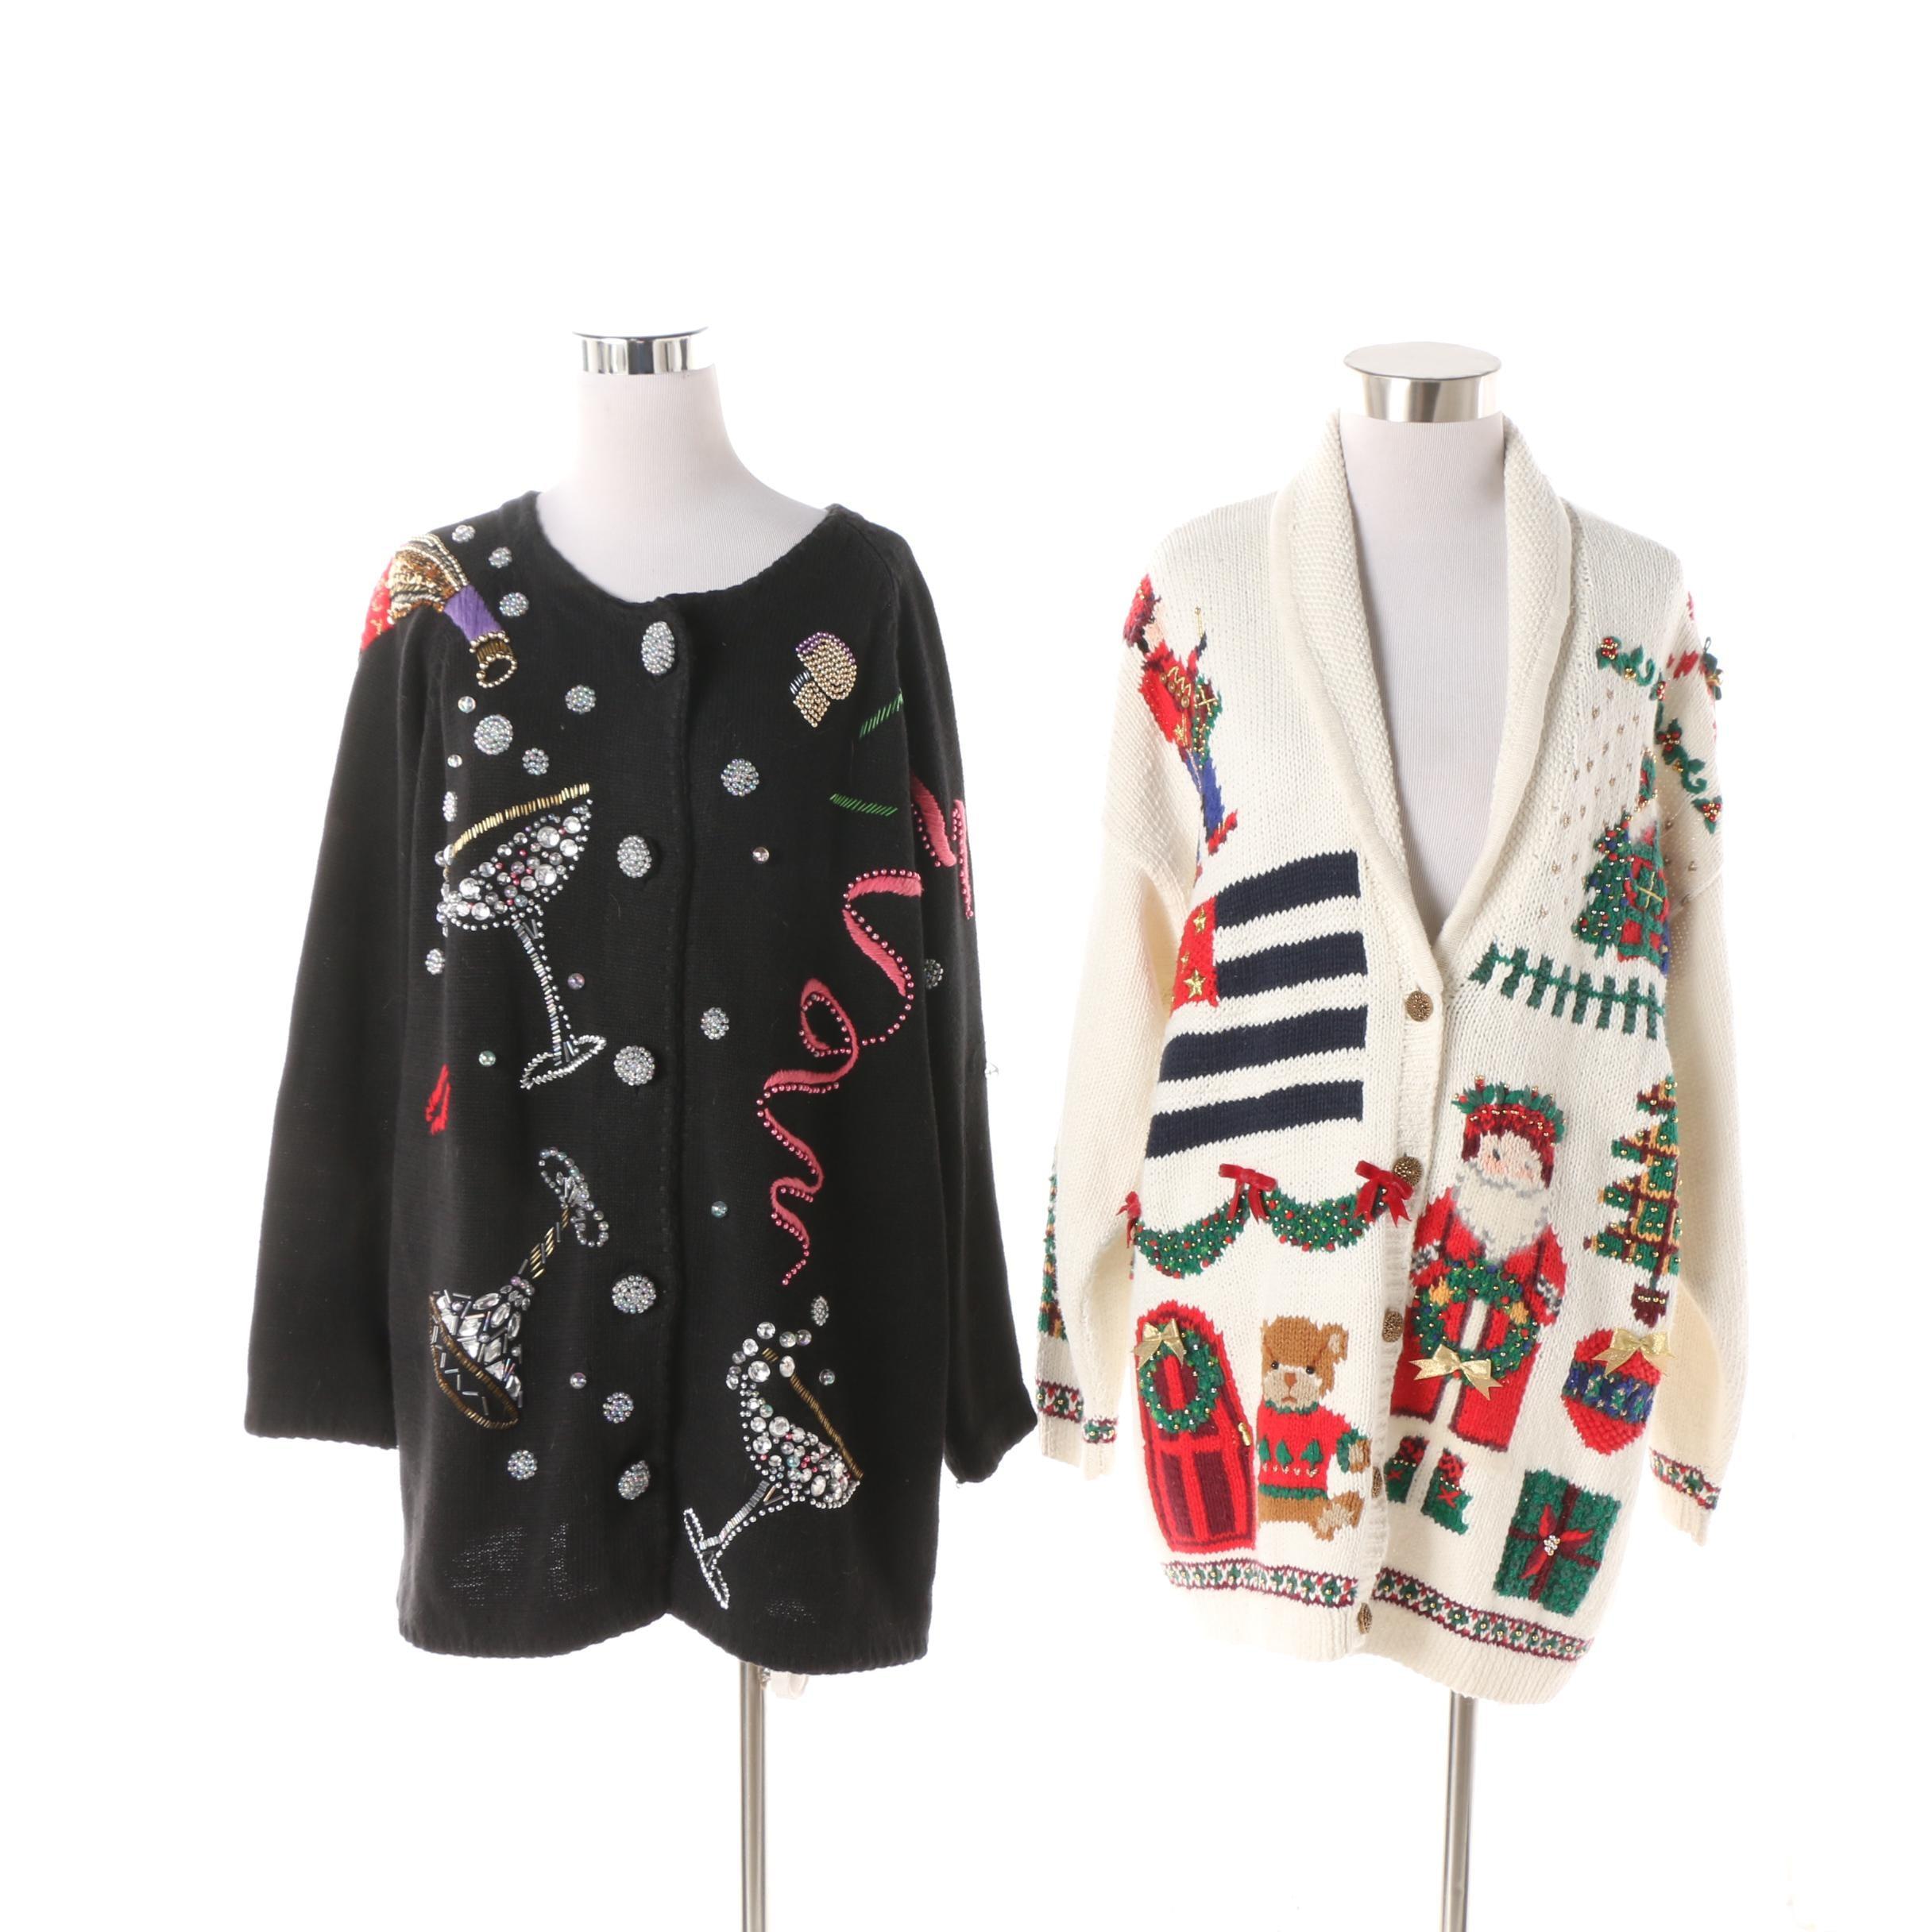 Women's Vintage Christmas and Cocktail Motif Embellished Knit Cardigans